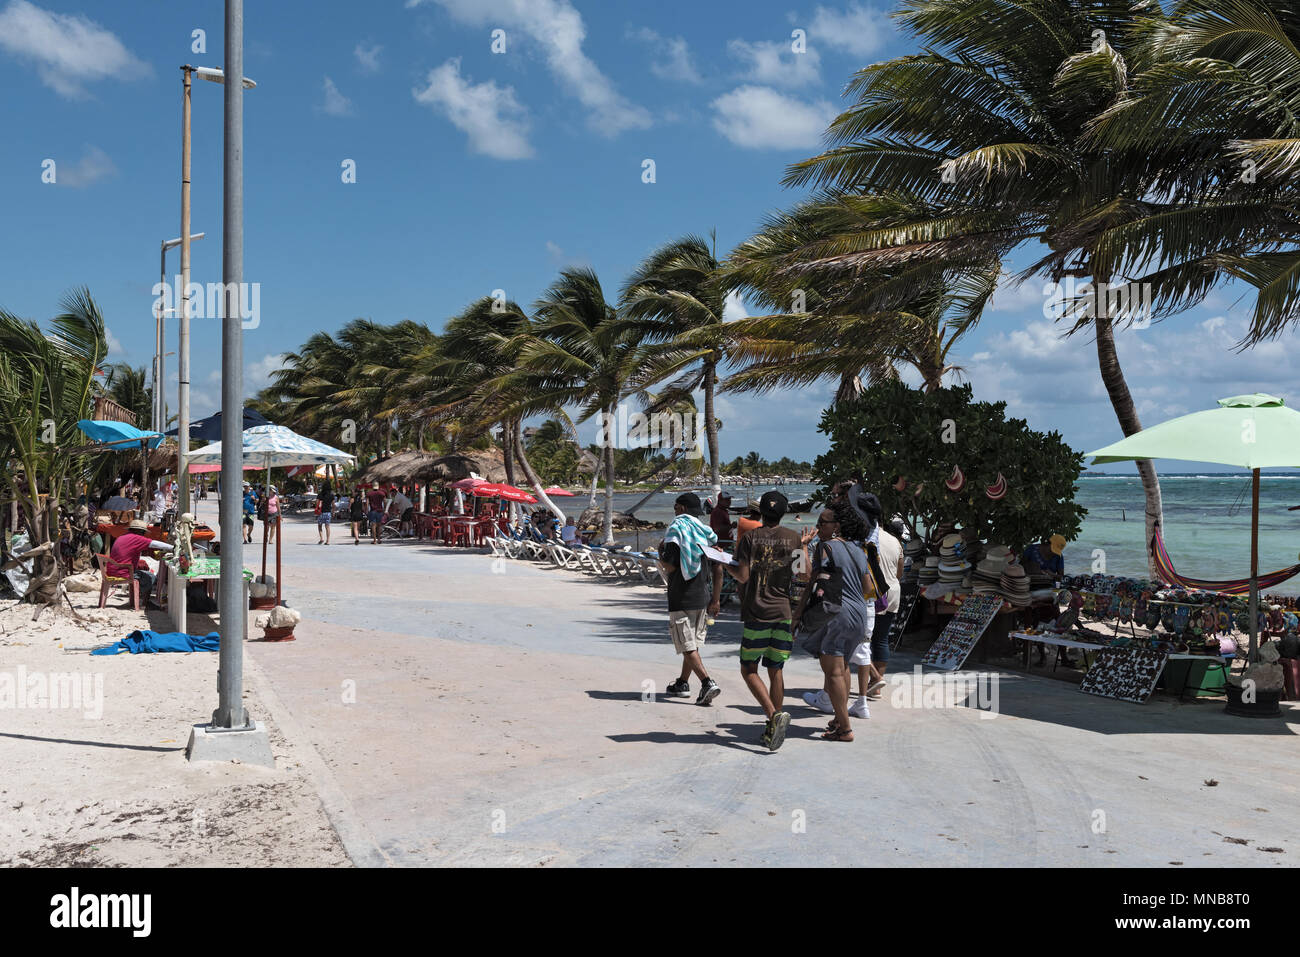 Beach With Souvenir Shops In Mahahual Quintana Roo Mexico Stock Photo Alamy